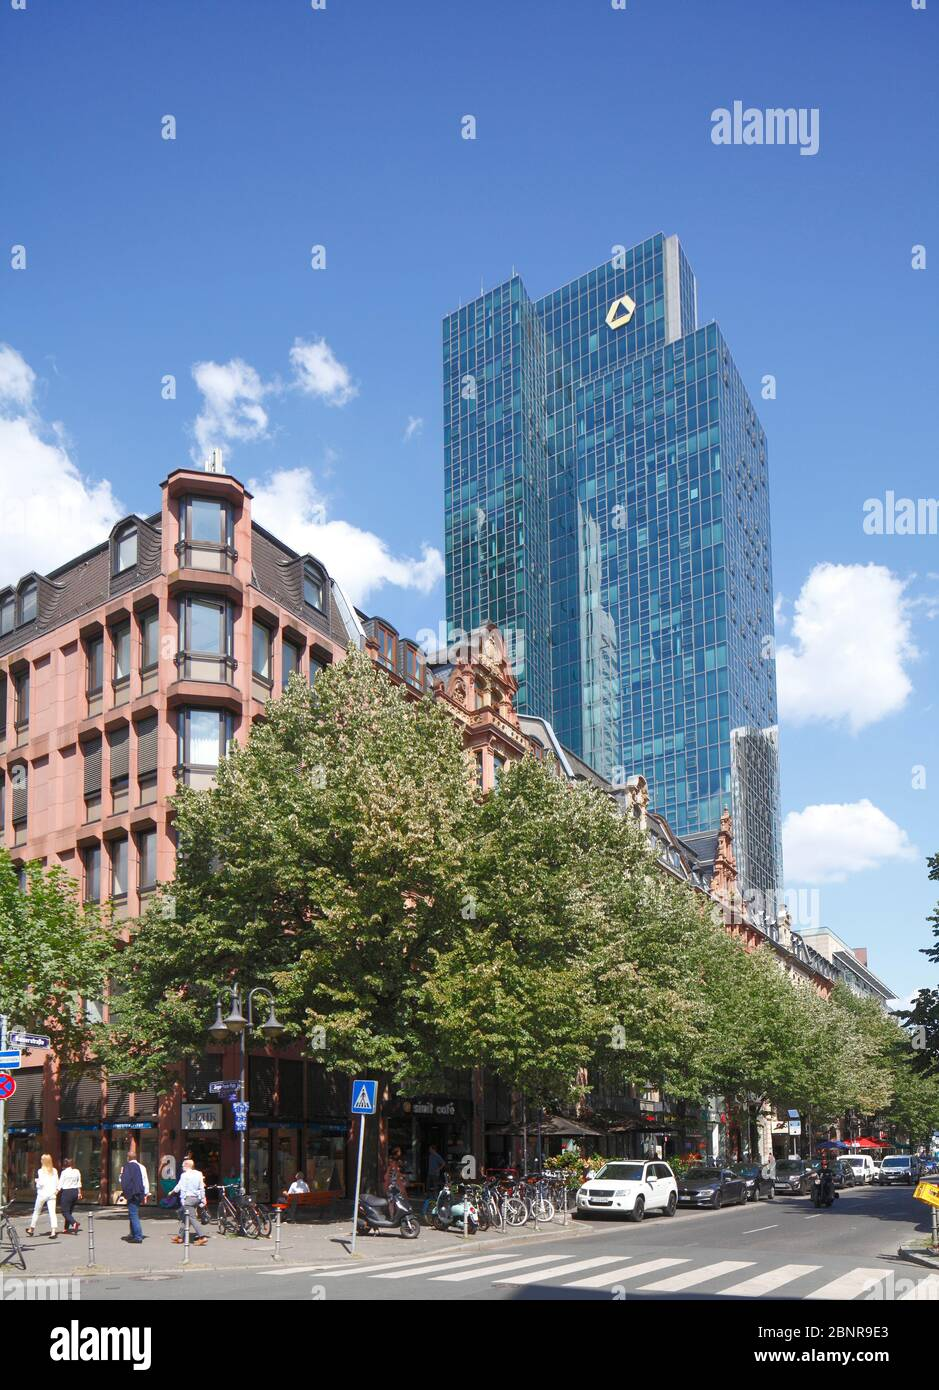 Gallileo skyscraper, Kaiserstrasse, financial district, Frankfurt am Main, Hesse, Germany, Europe Stock Photo